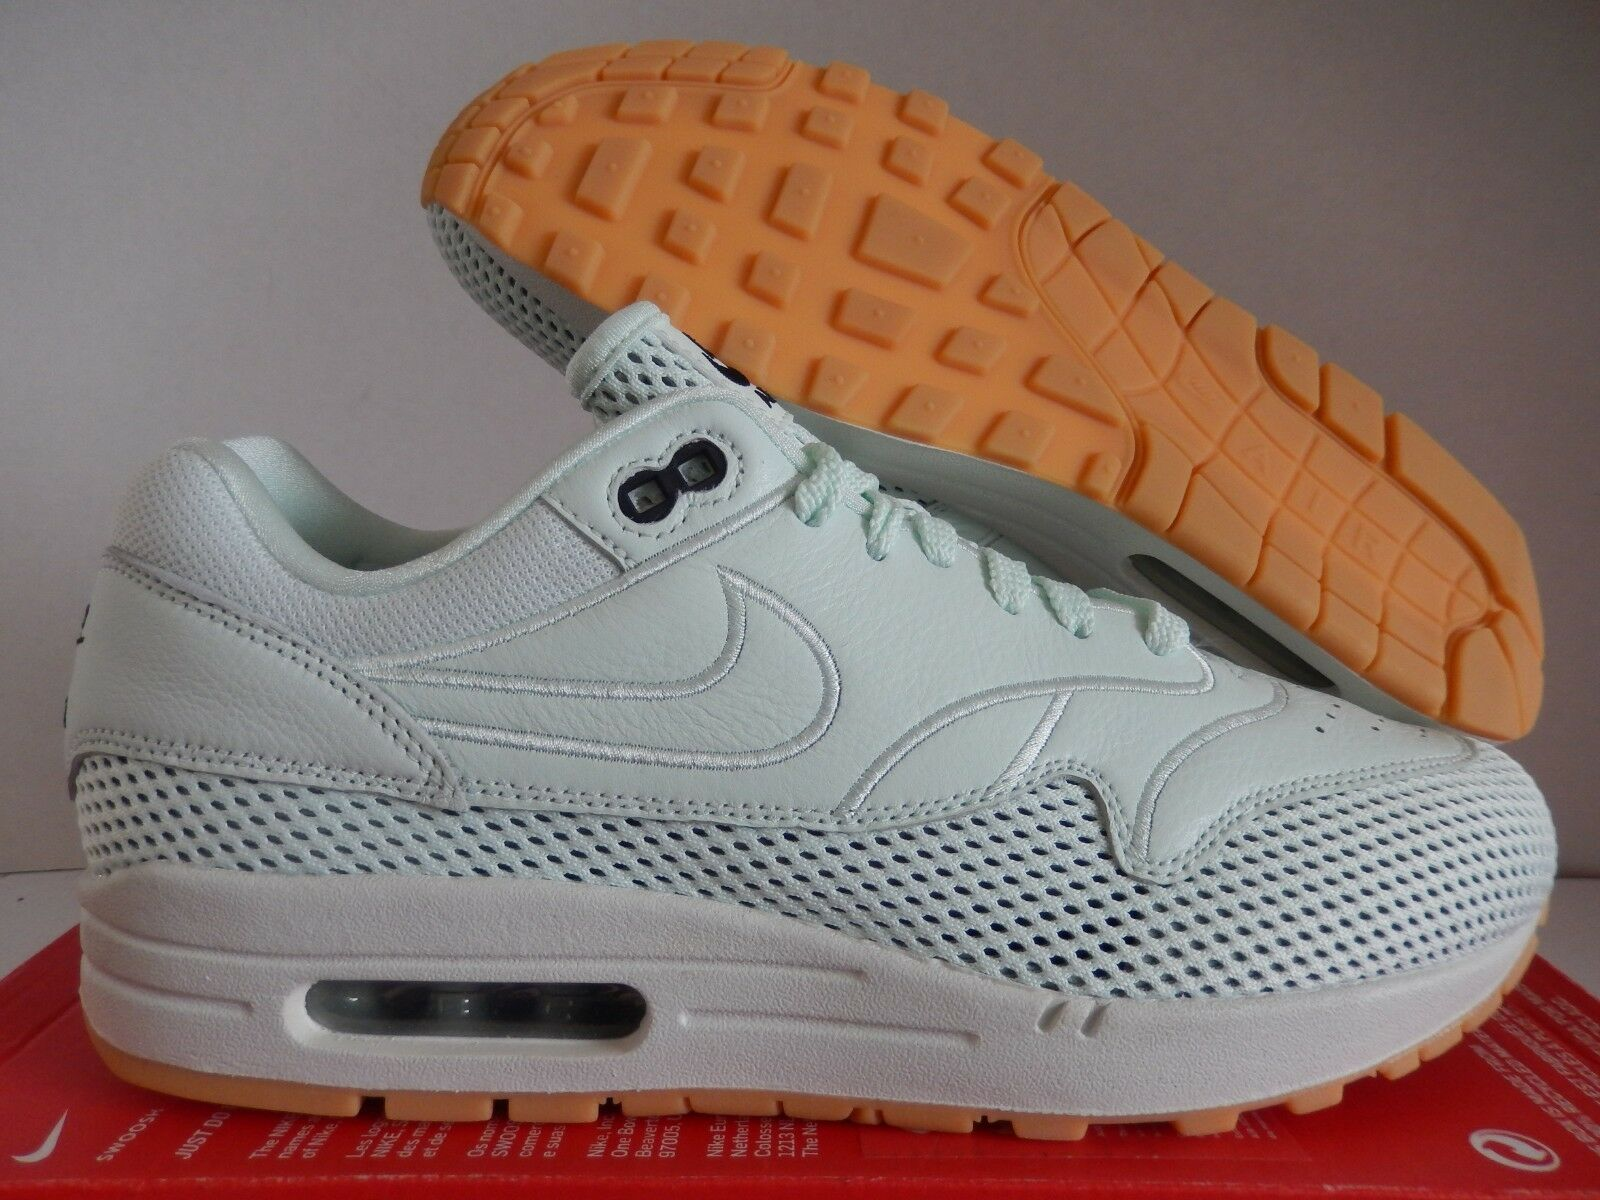 Nike air max 1 e a malapena green sz 12 donne / uomini sz - ao2366-300]